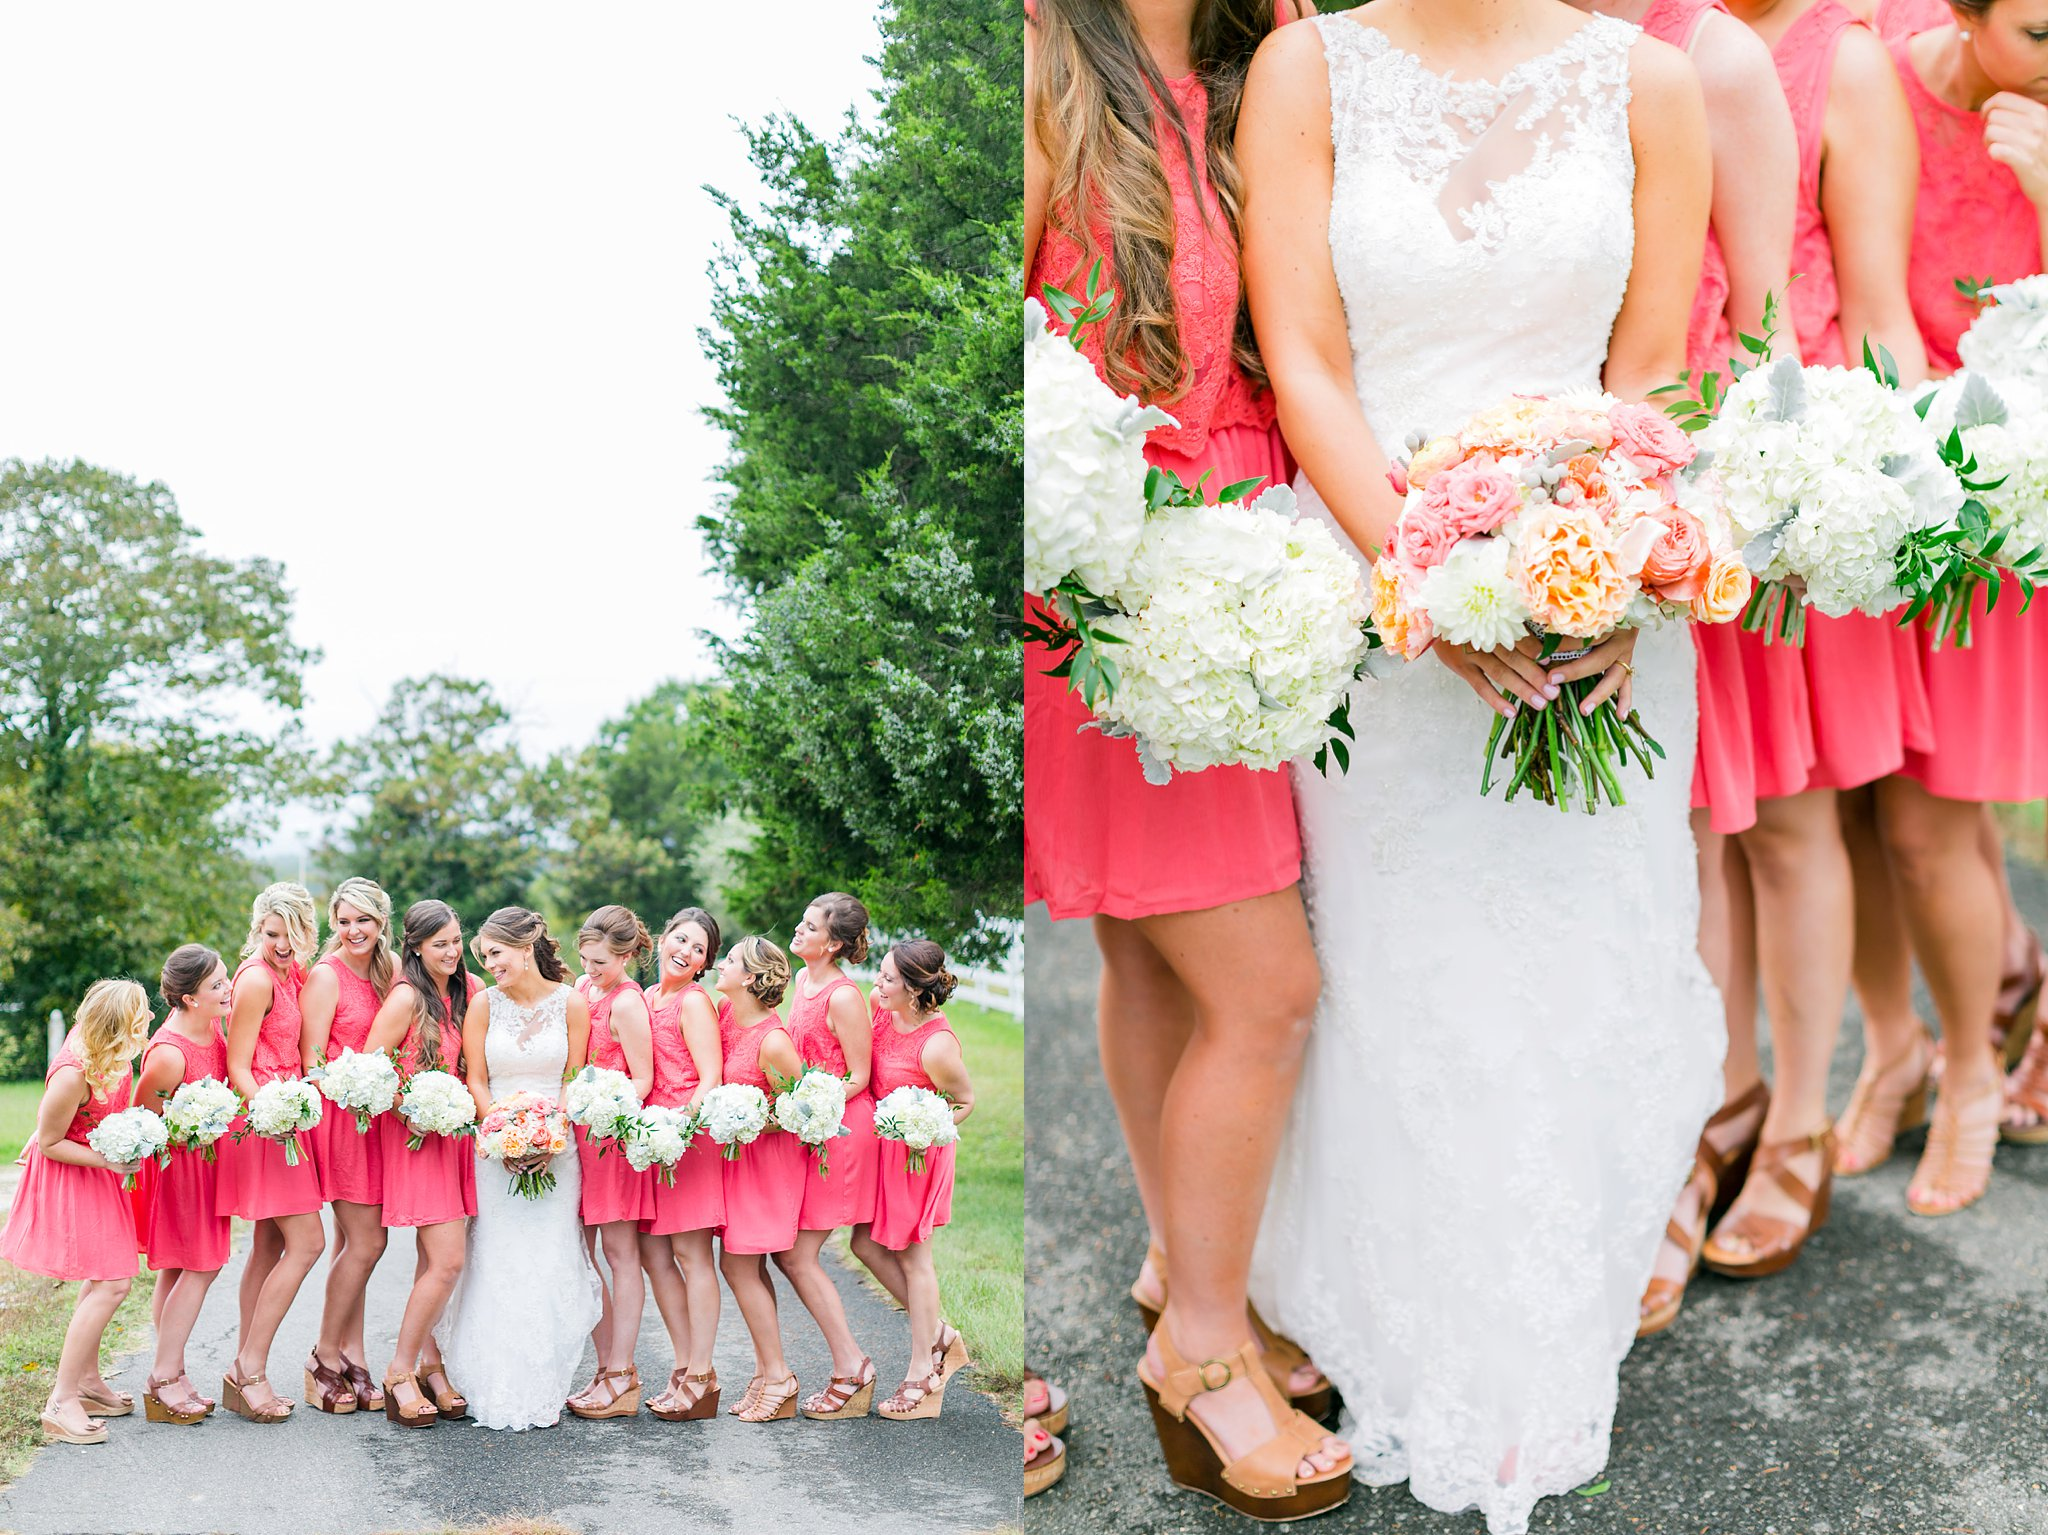 Stone Tower Winery Wedding Photos Virginia Wedding Photographer Megan Kelsey Photography Sam & Angela-59.jpg